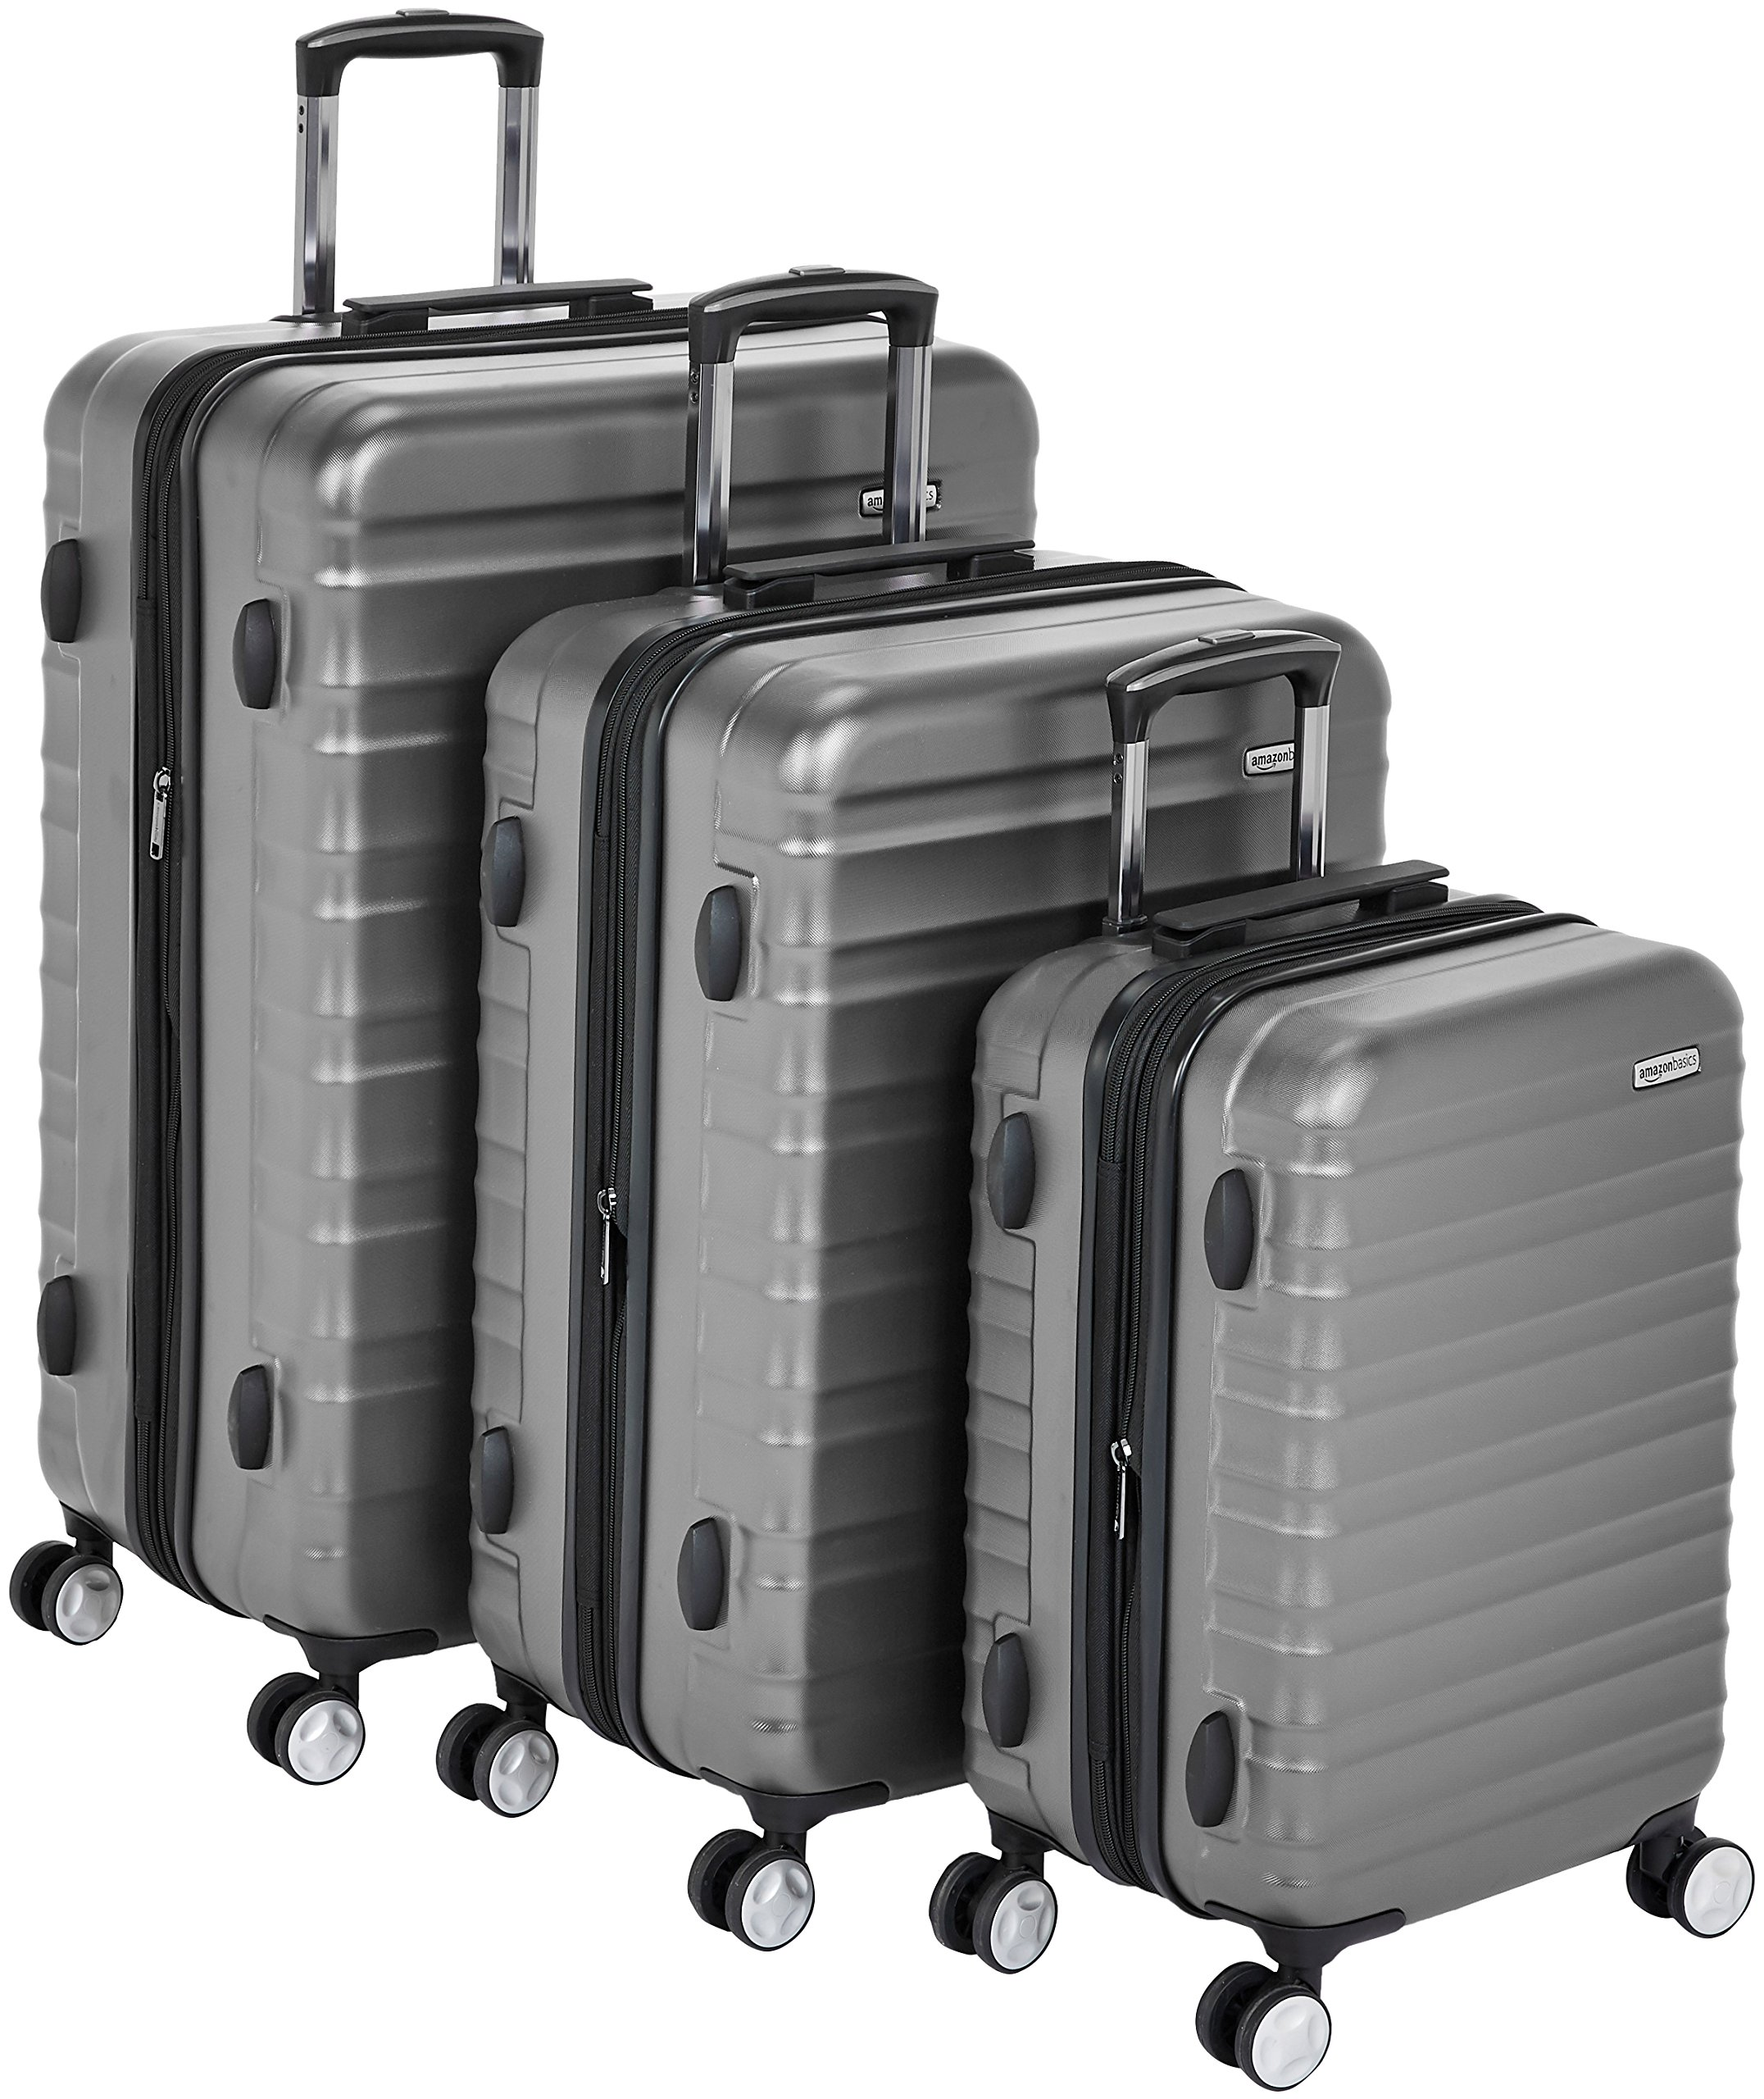 AmazonBasics Premium Hardside Spinner Luggage with Built-In TSA Lock - 3-Piece Set (20'', 24'', 28''), Grey